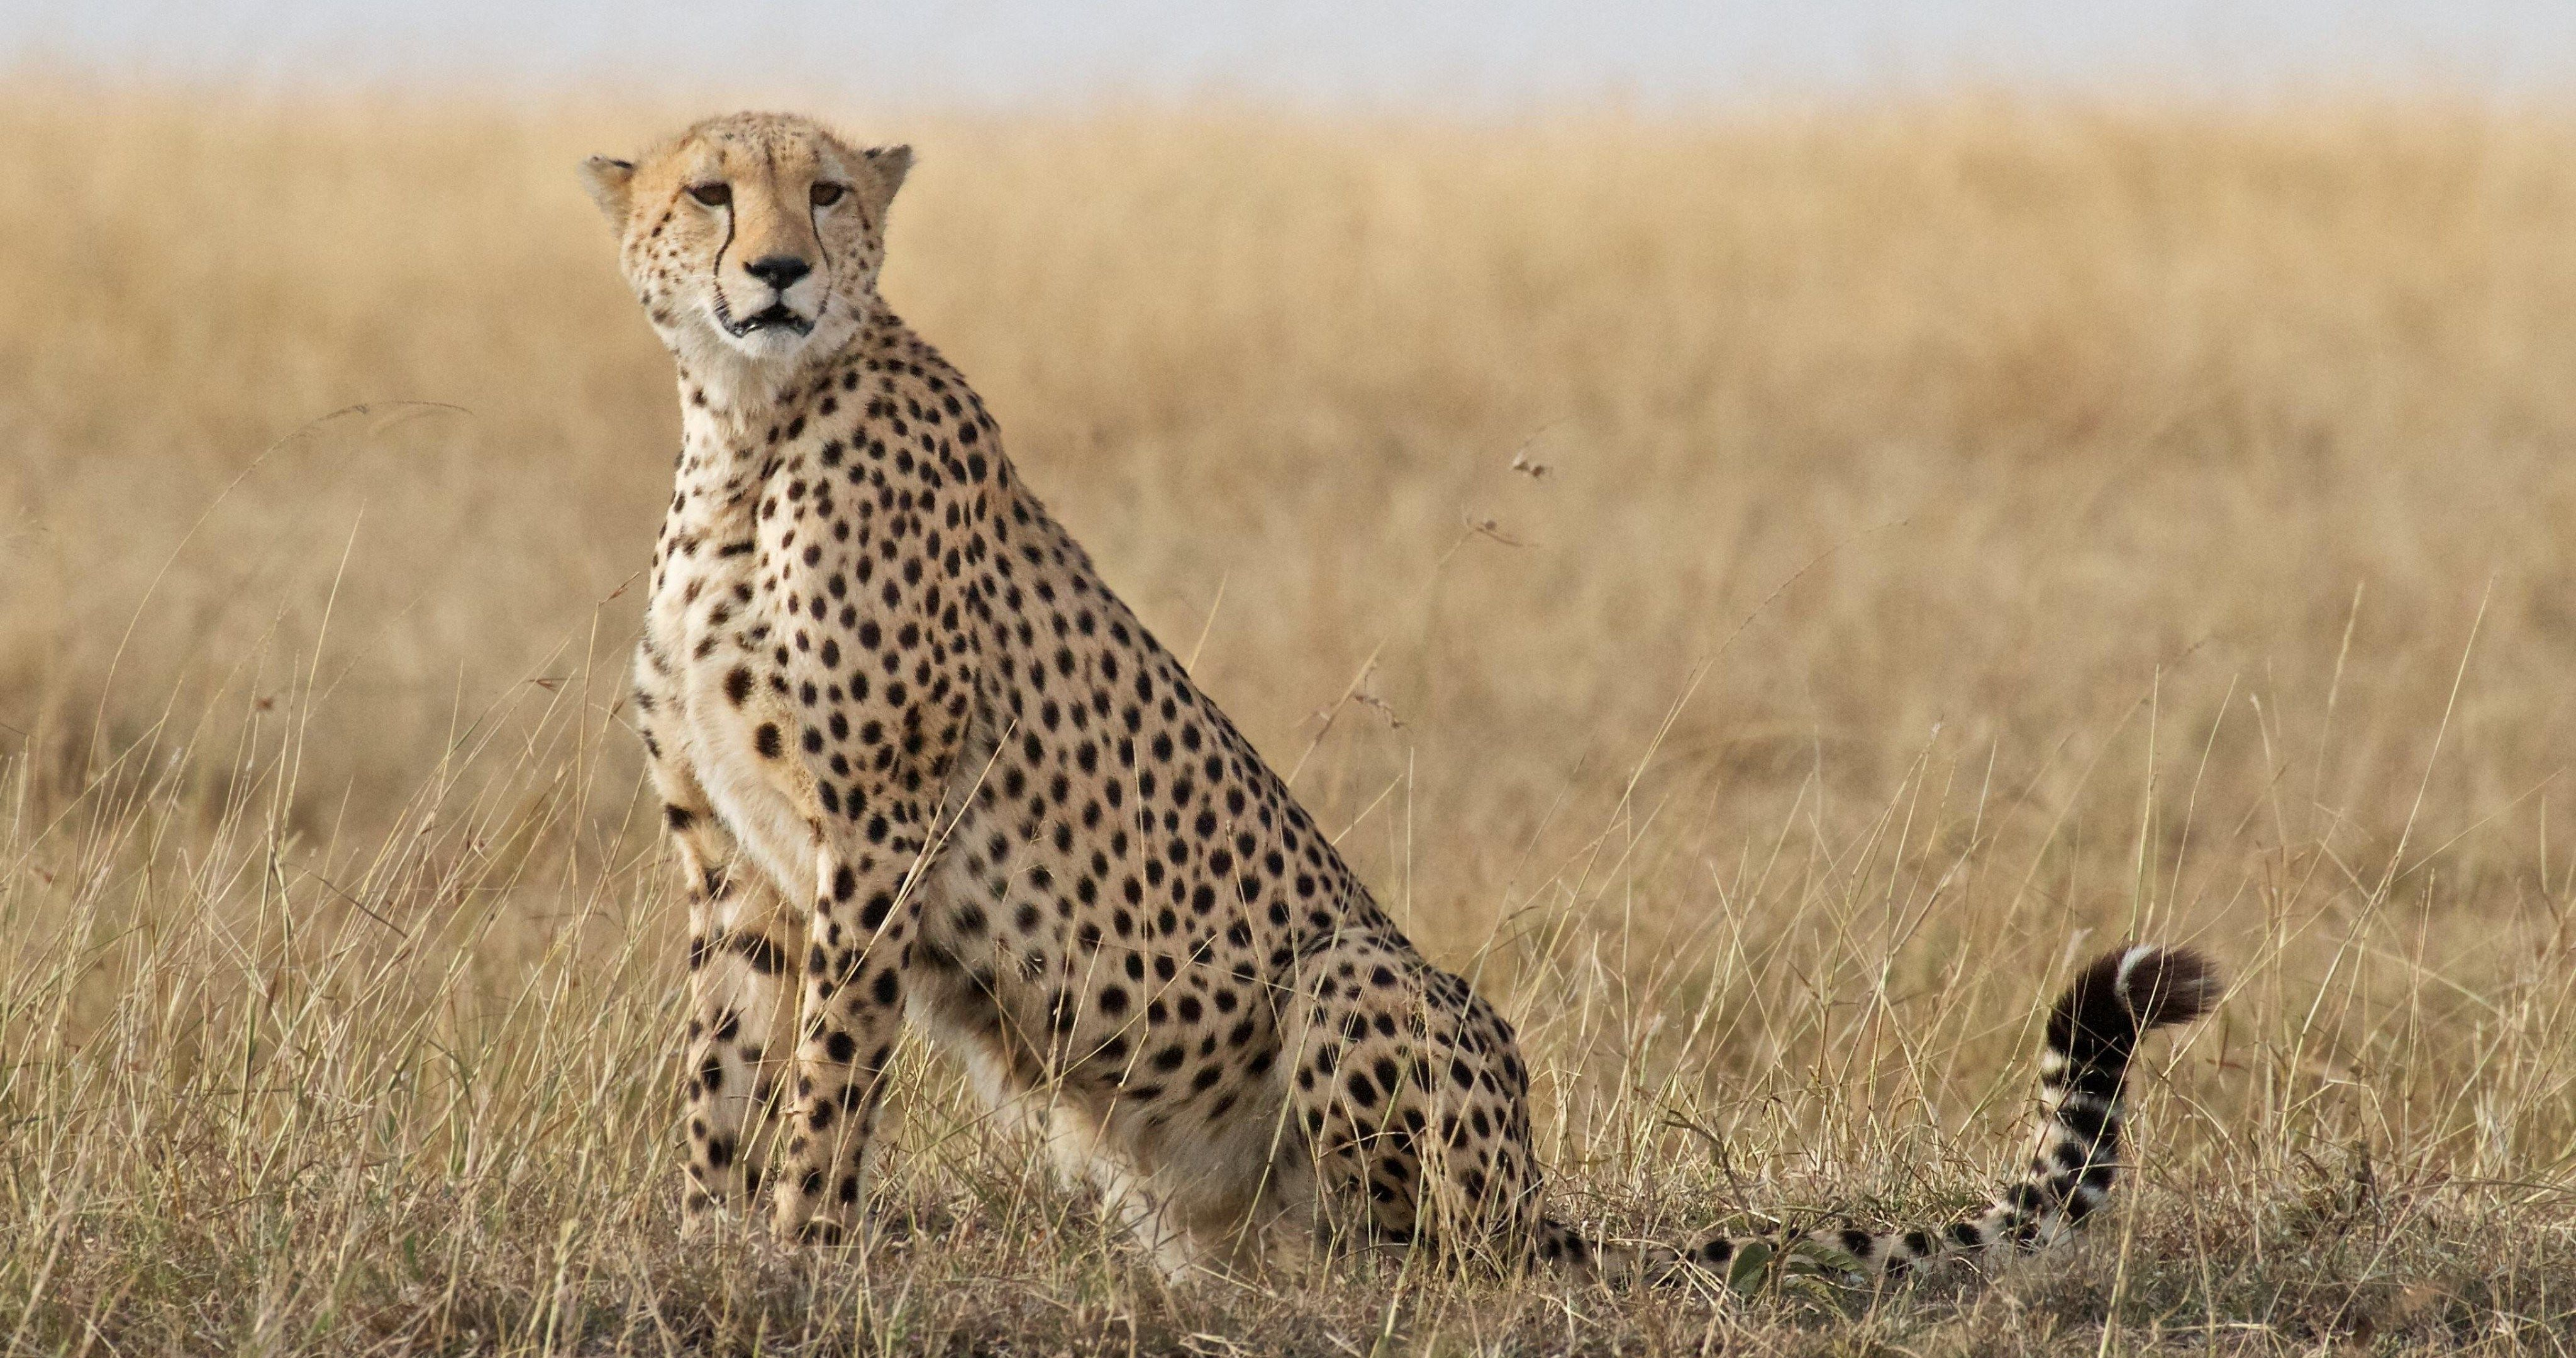 cheetah 4k ultra hd wallpaper ololoshka Pinterest Cheetahs